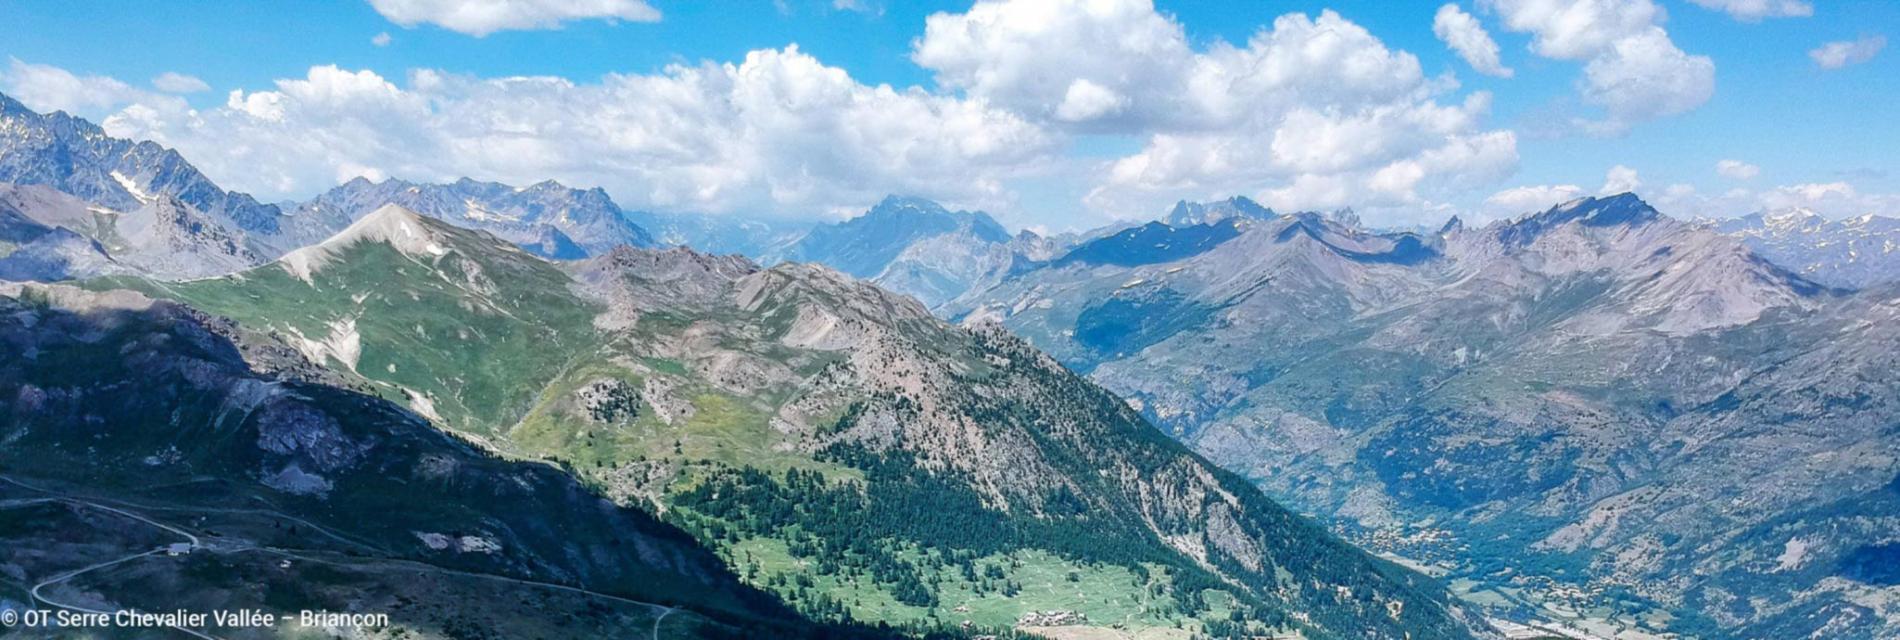 Slide Les massifs de Serre Chevalier